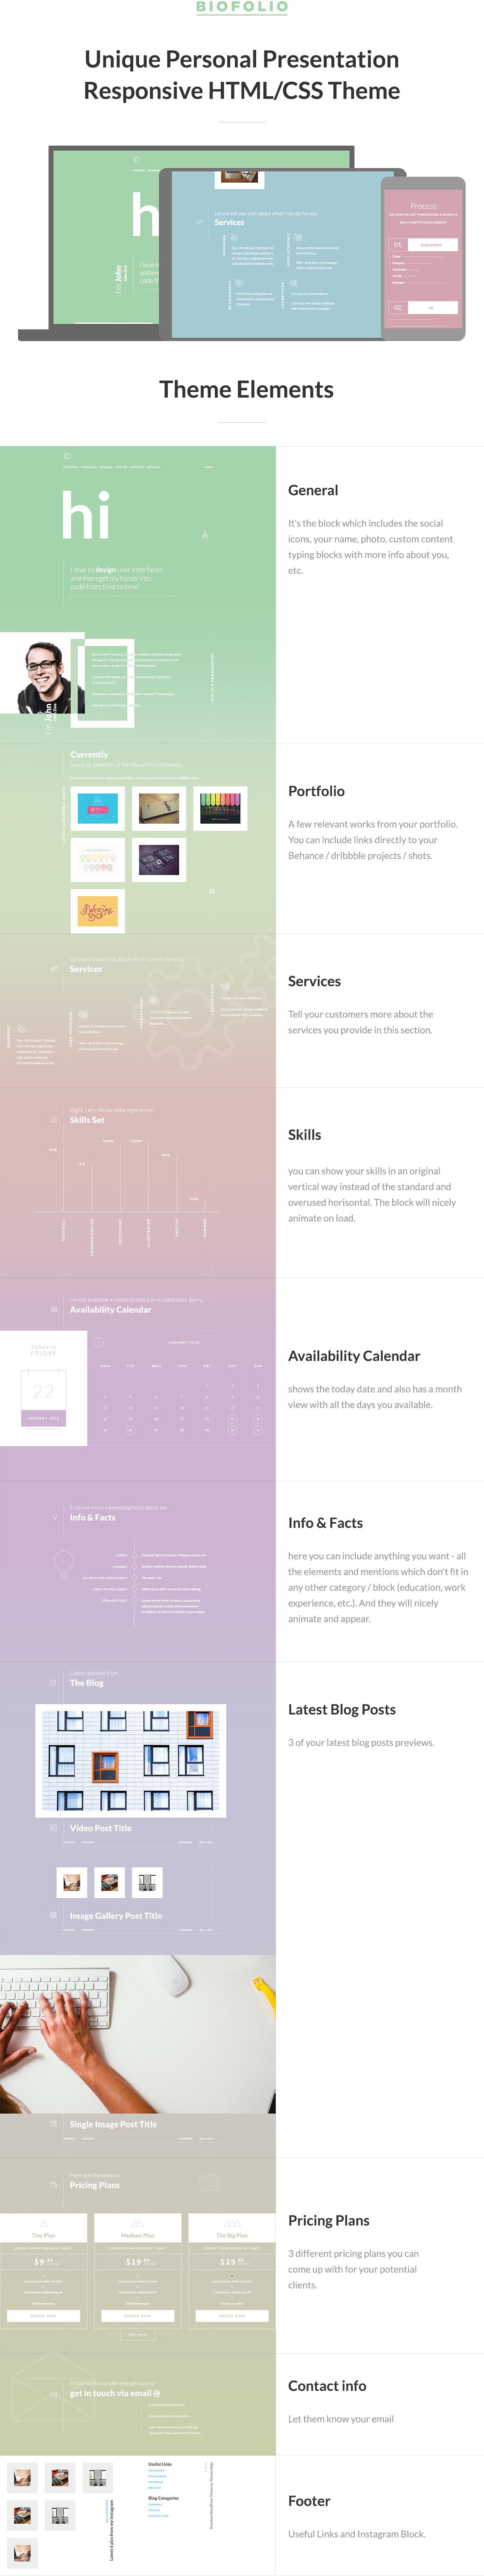 BioFolio - Resume & Portfolio HTML/CSS Template - 1